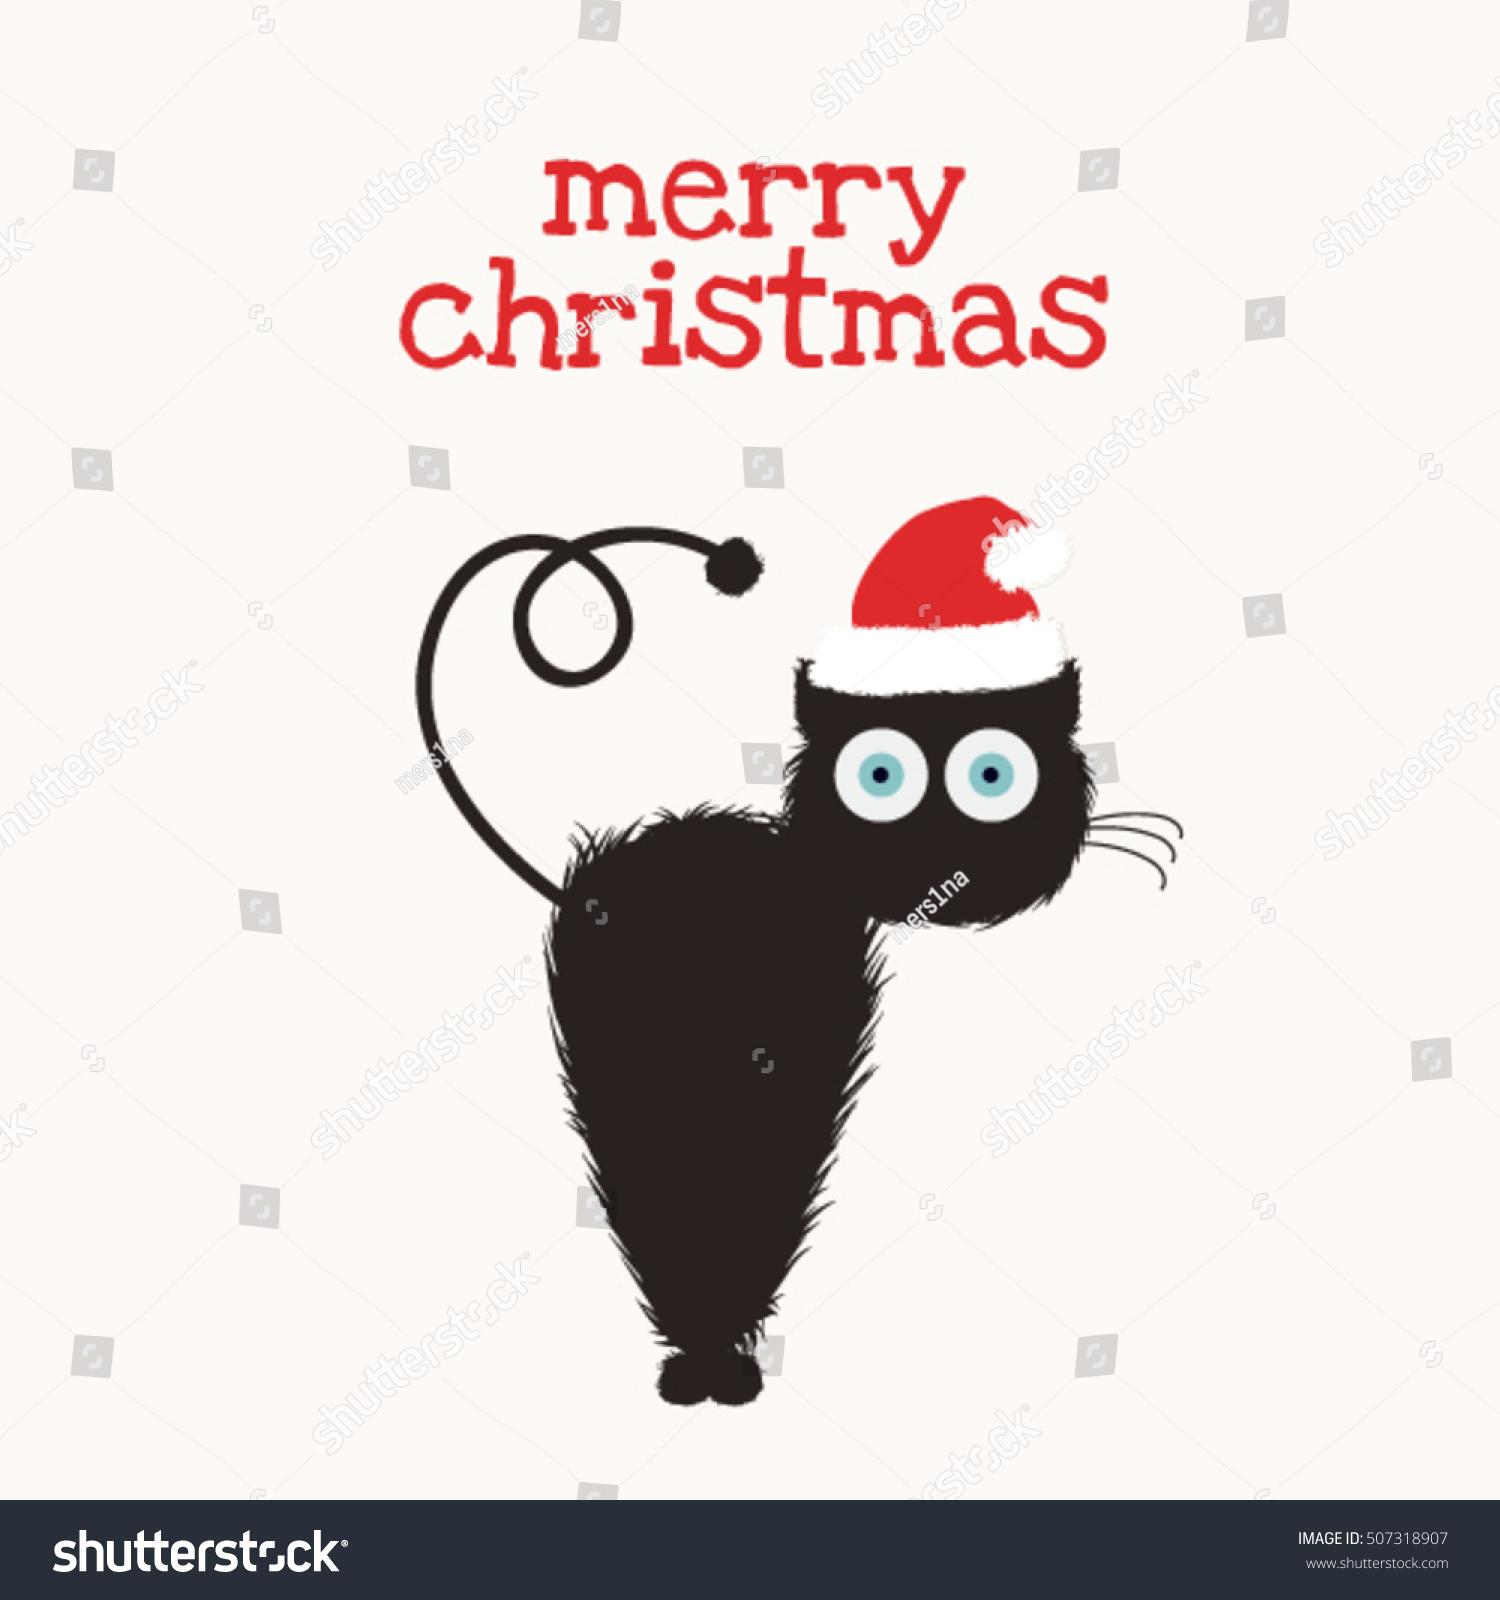 36d071fe37db5 Merry Christmas Cute Funny Black Cat Stock Vector (Royalty Free ...